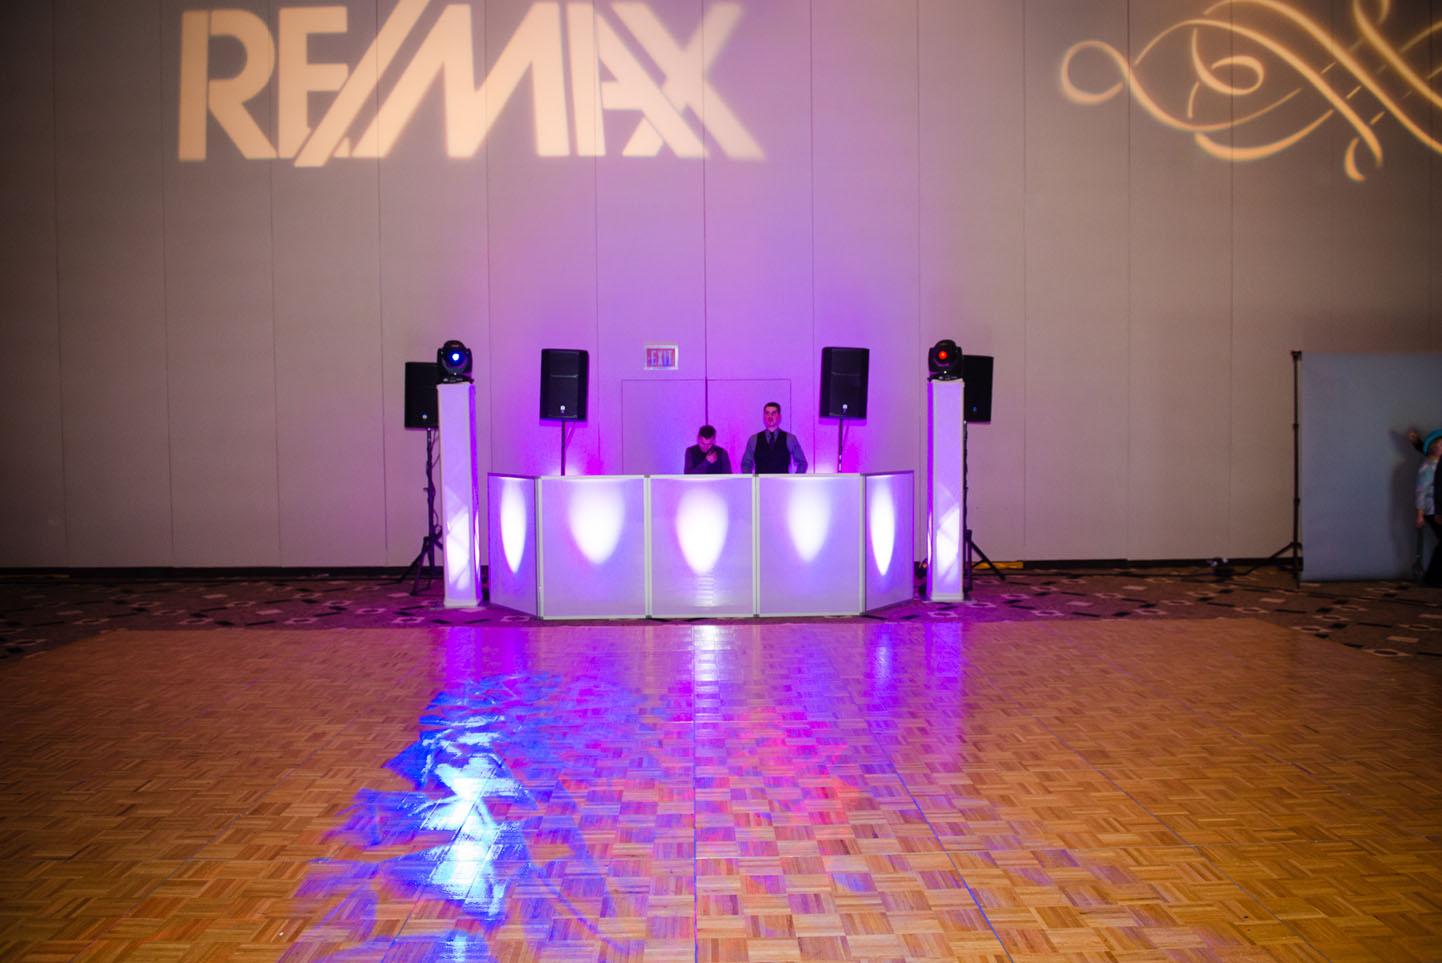 2015-12-09 ReMax Corpoarte Event - The Borgata - Atlantic City NJ - Photo Sesh - 2015-5033.jpg